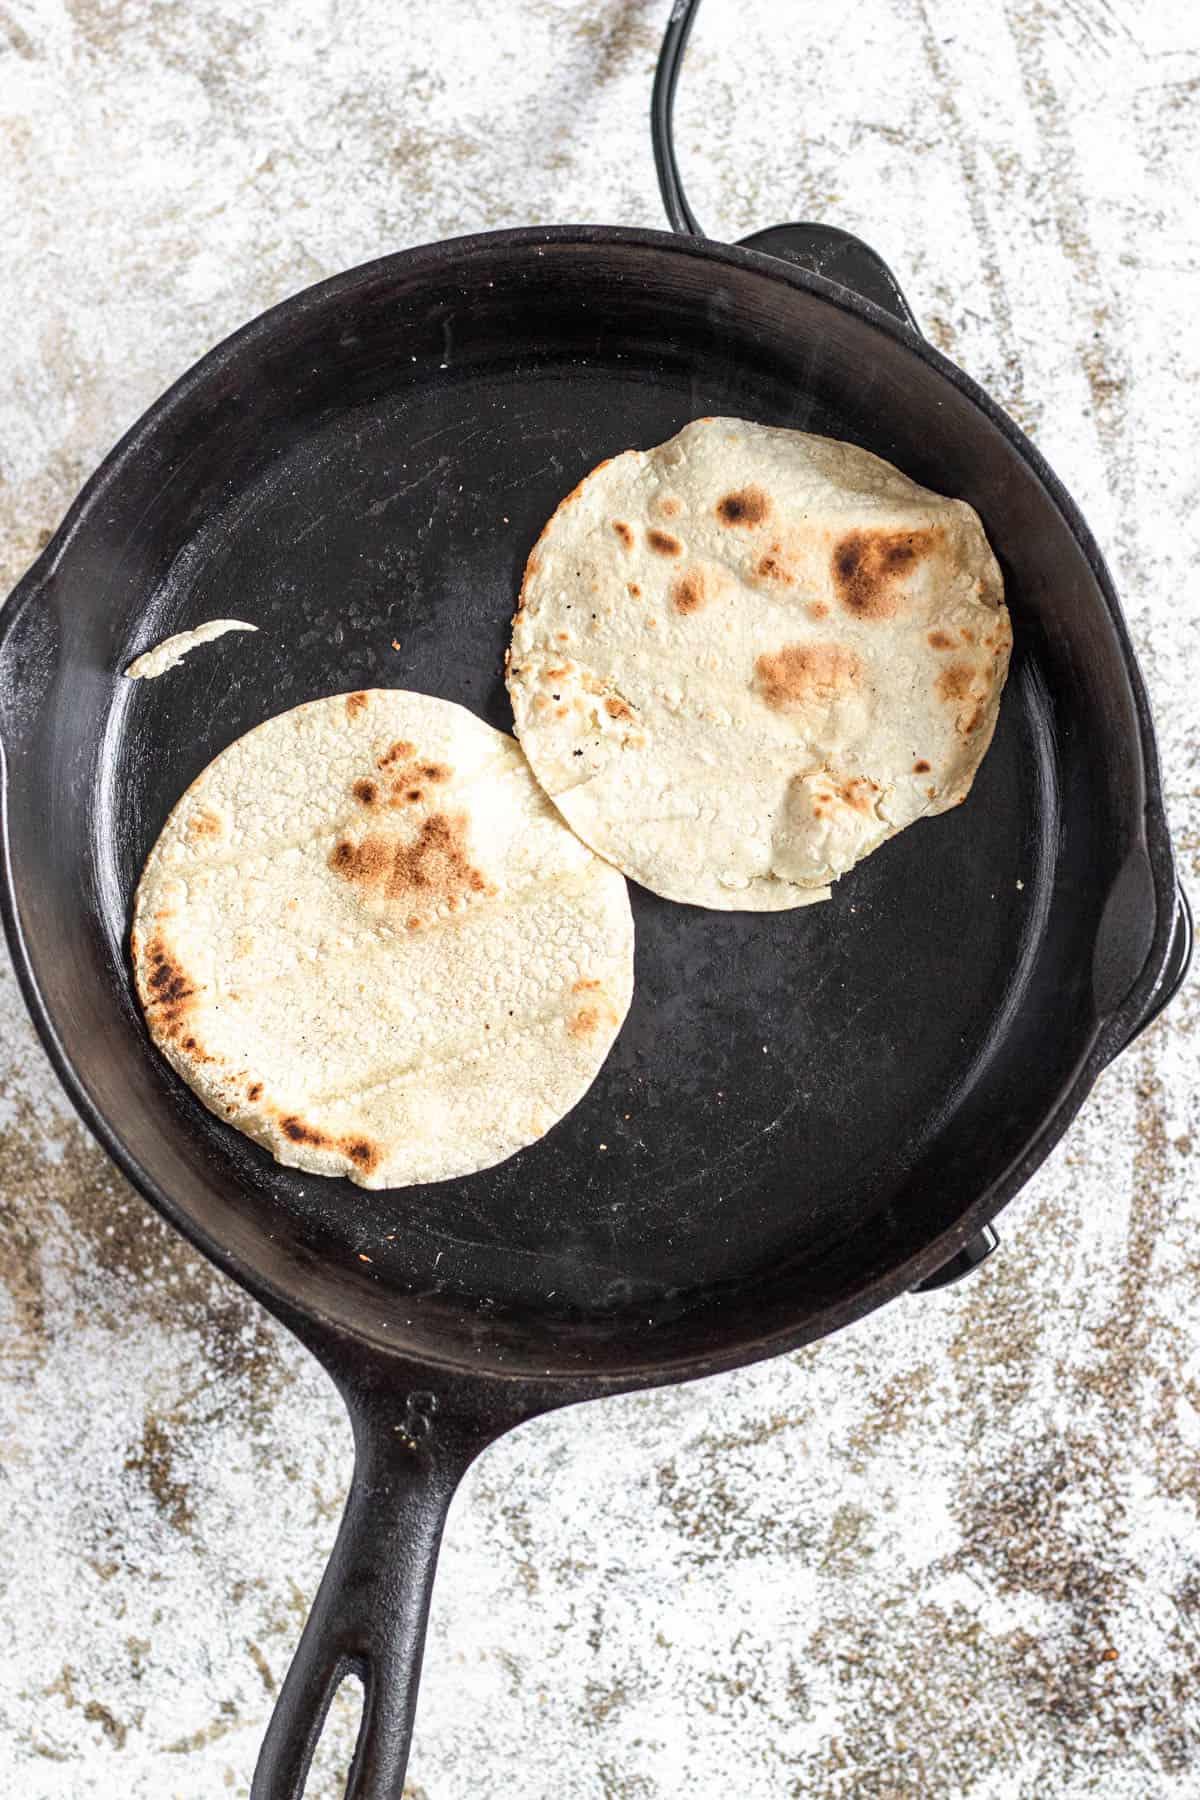 Toasted corn tortillas